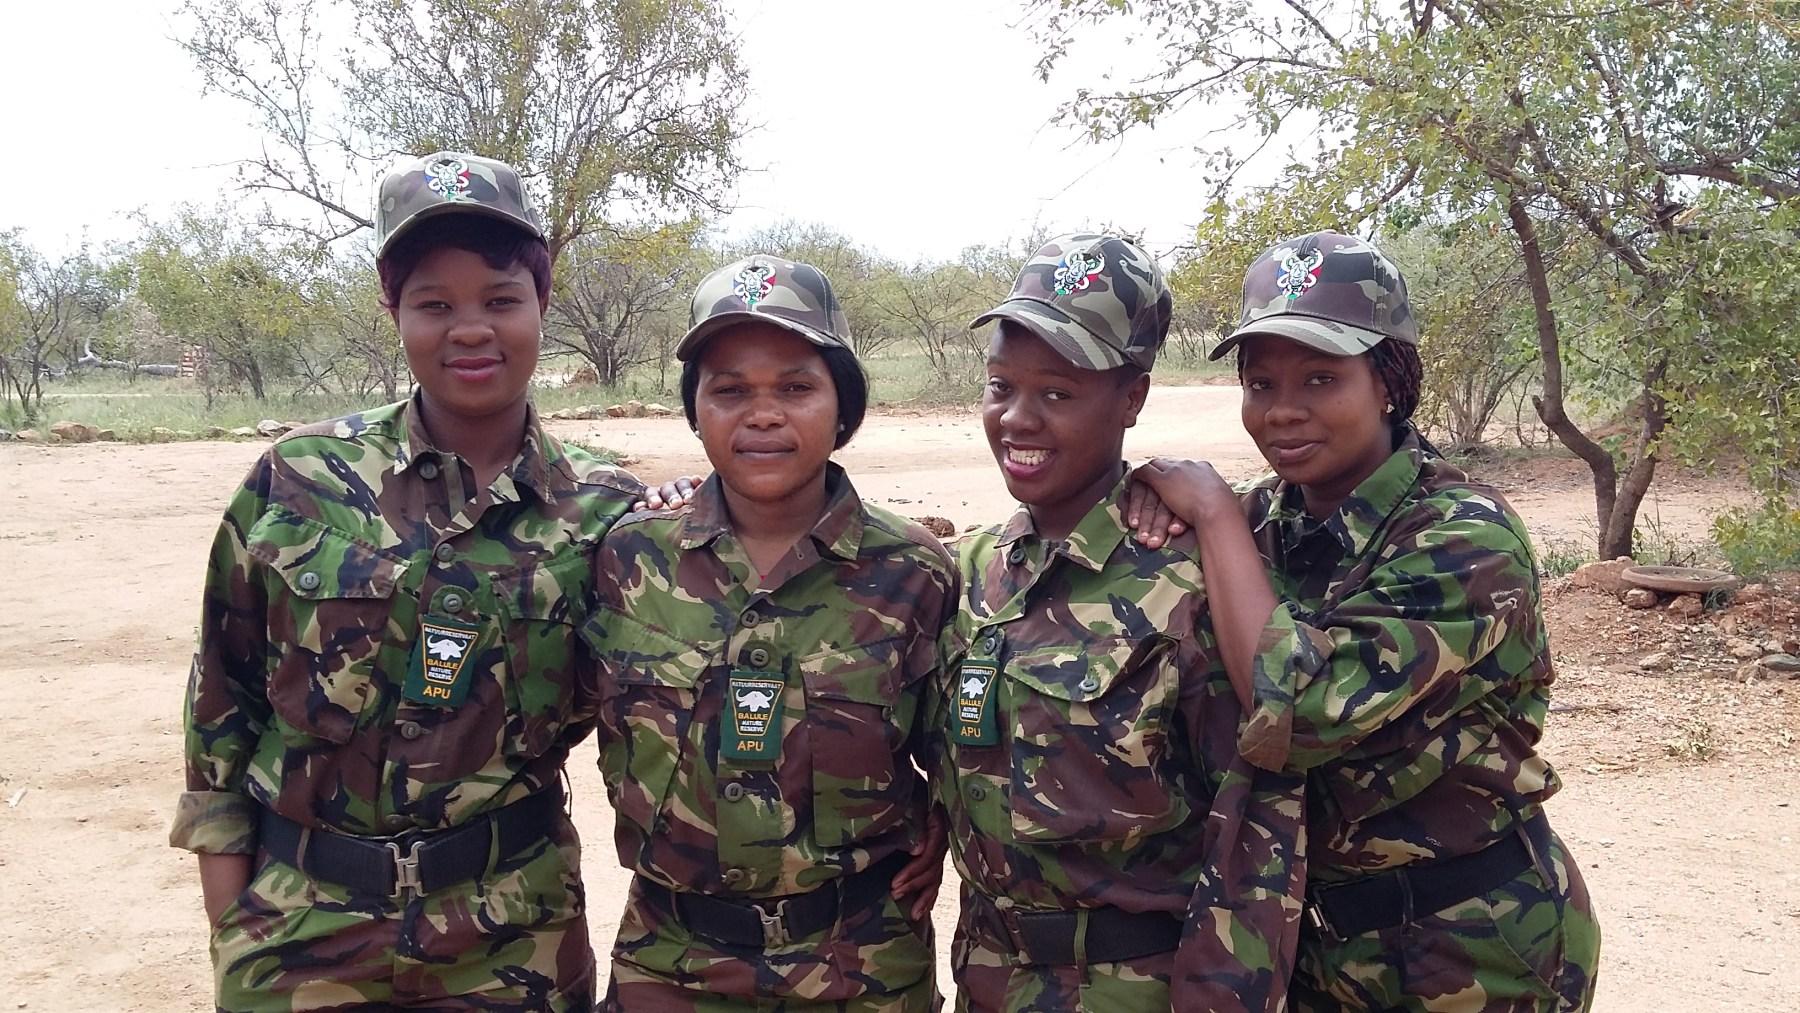 Female members of Black Mamba Anti-Poaching Unit (Courtesy of the Black Mambas)